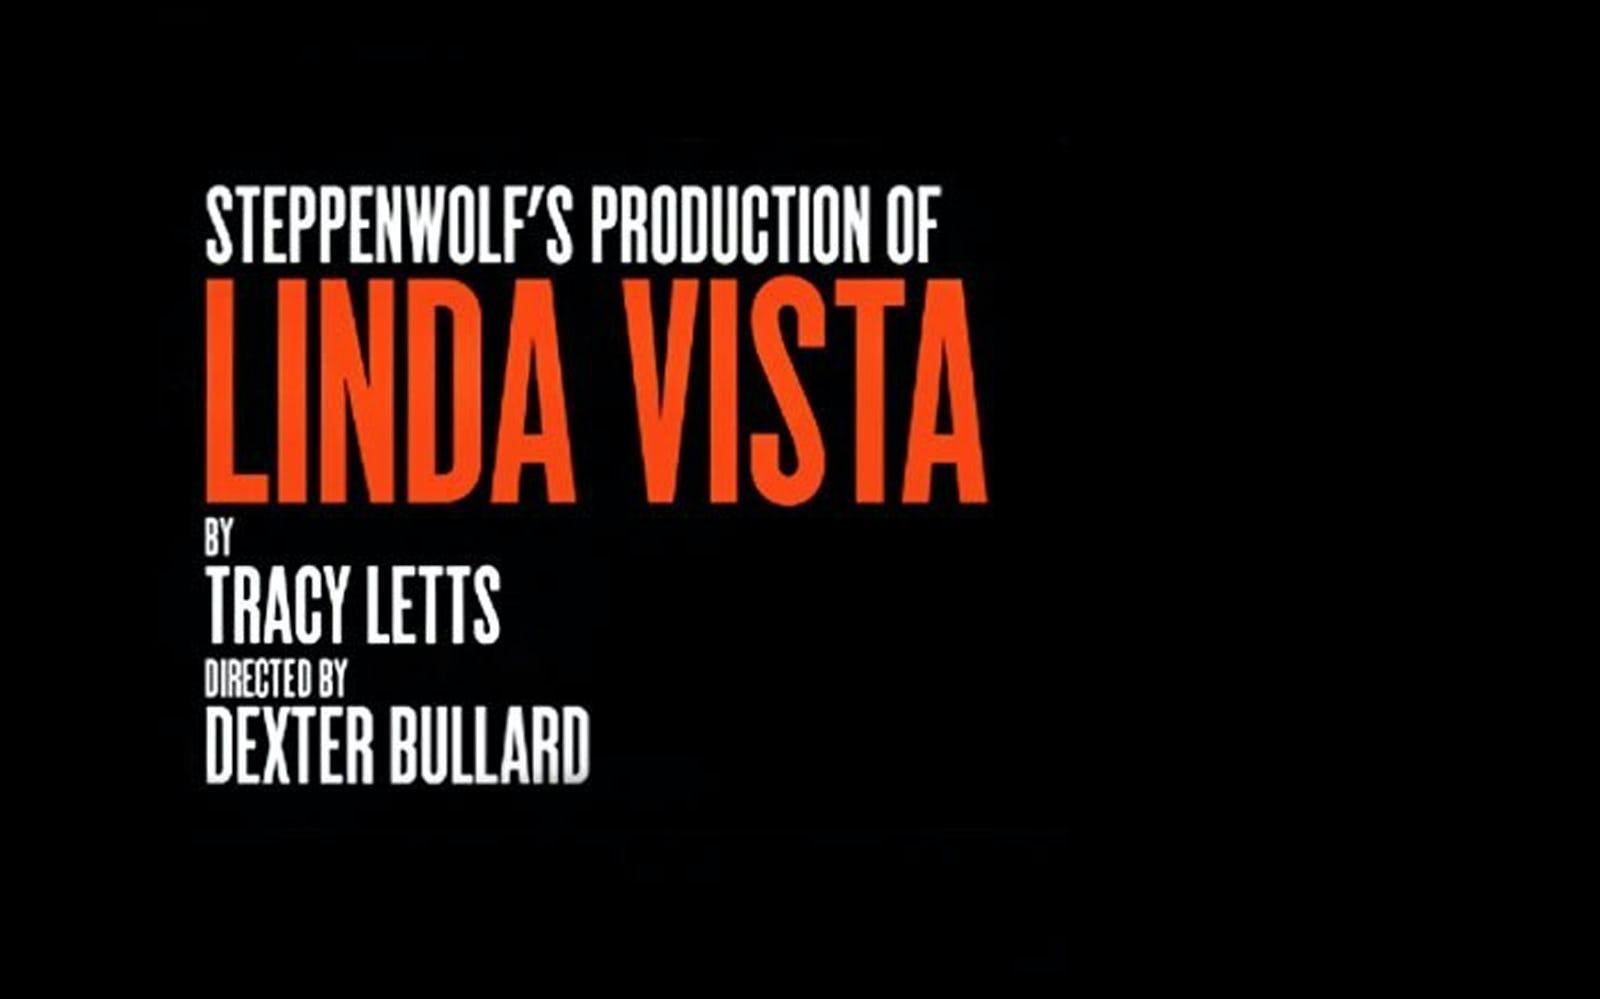 Linda Vista on Broadway